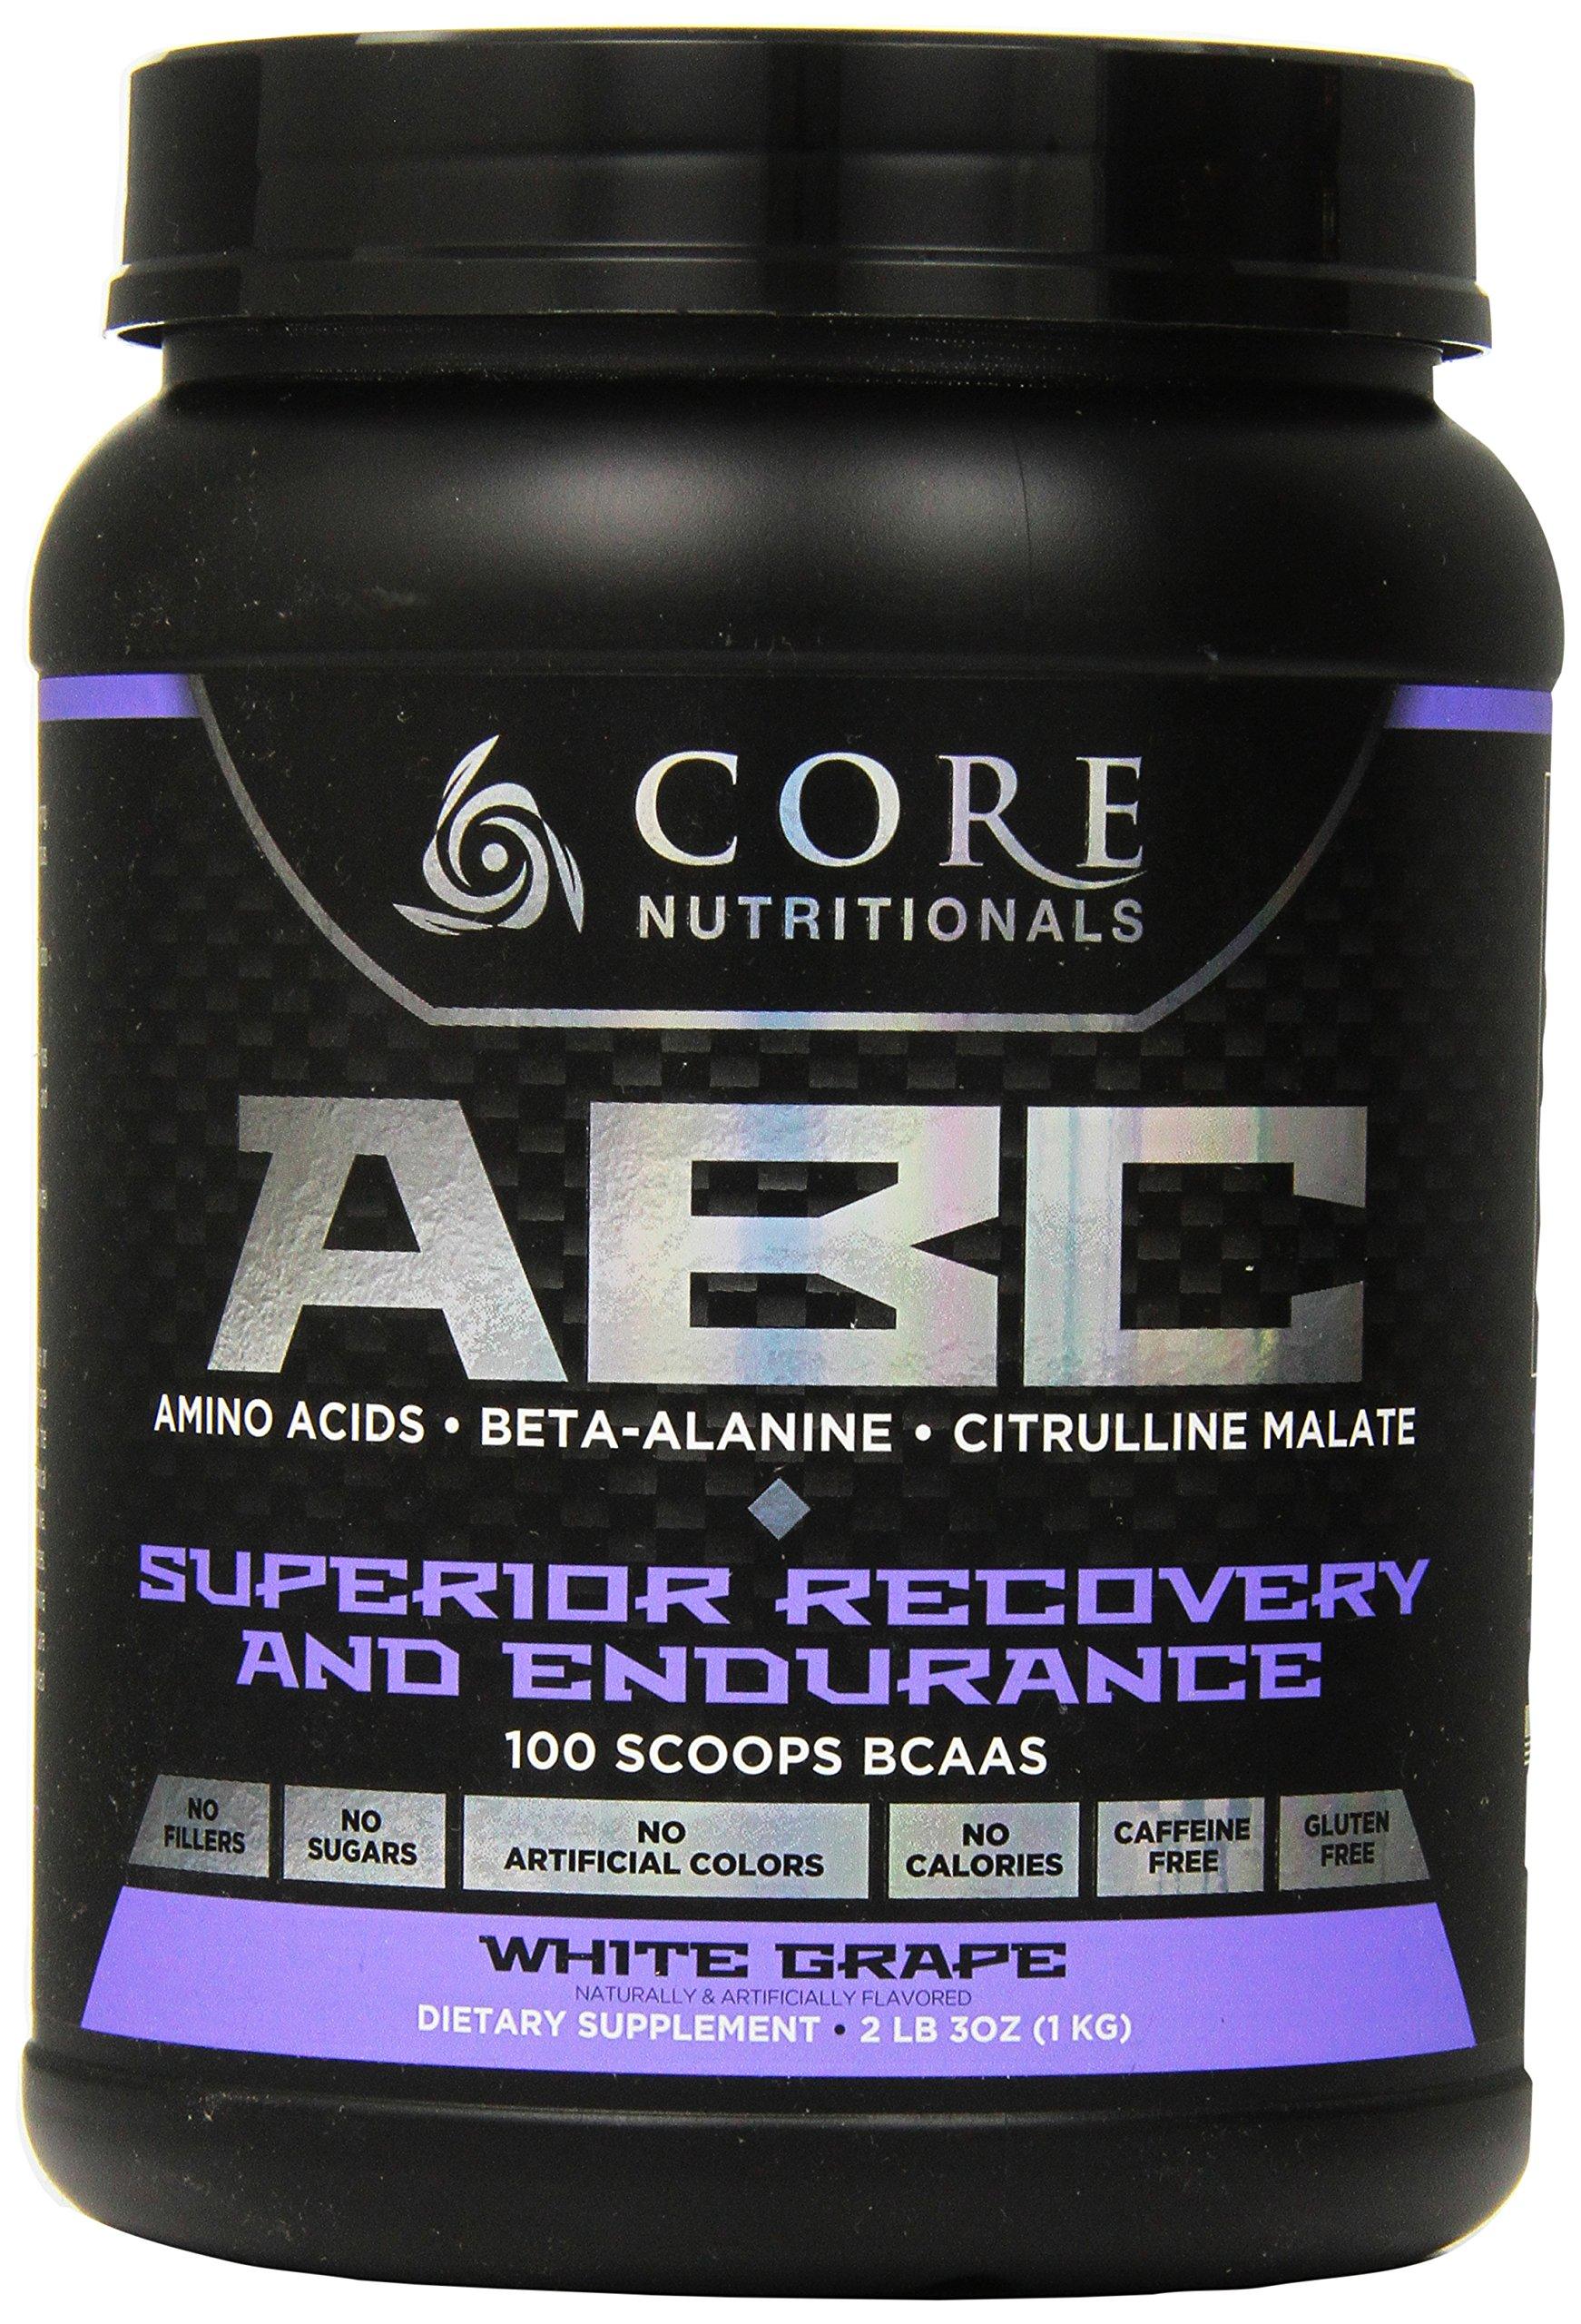 Amazon.com: Core Nutritionals Hmb Dietary Supplement, 90 Gram: Health & Personal Care